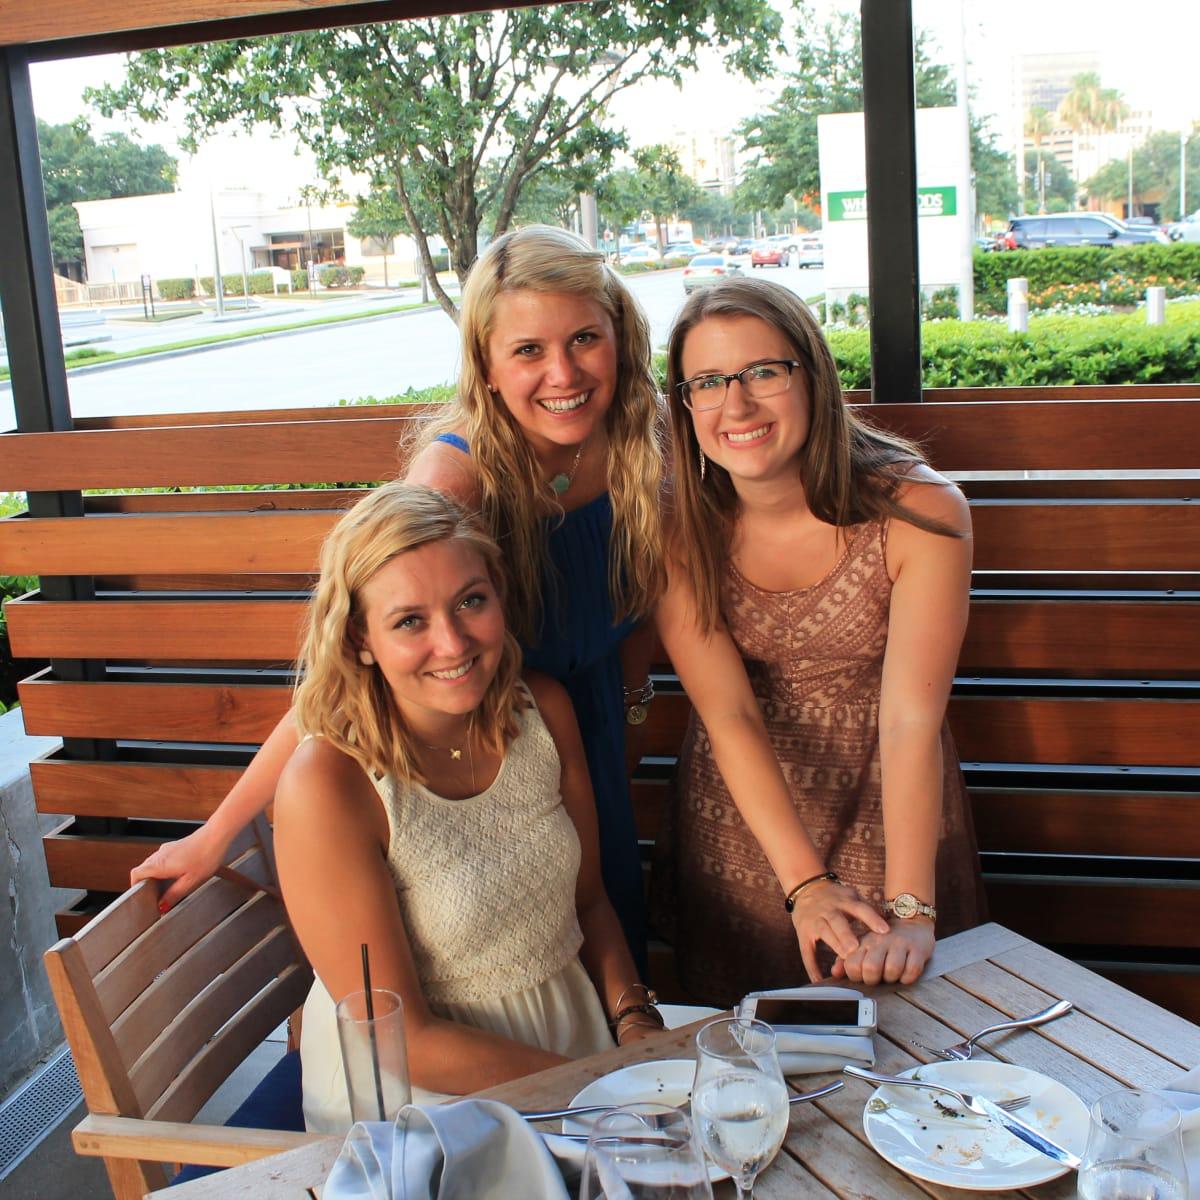 News, Shelby, Omar Pereny's 21st birthday, July 2015, Natalie Harms, Emily Wilkinson and Cara Smith